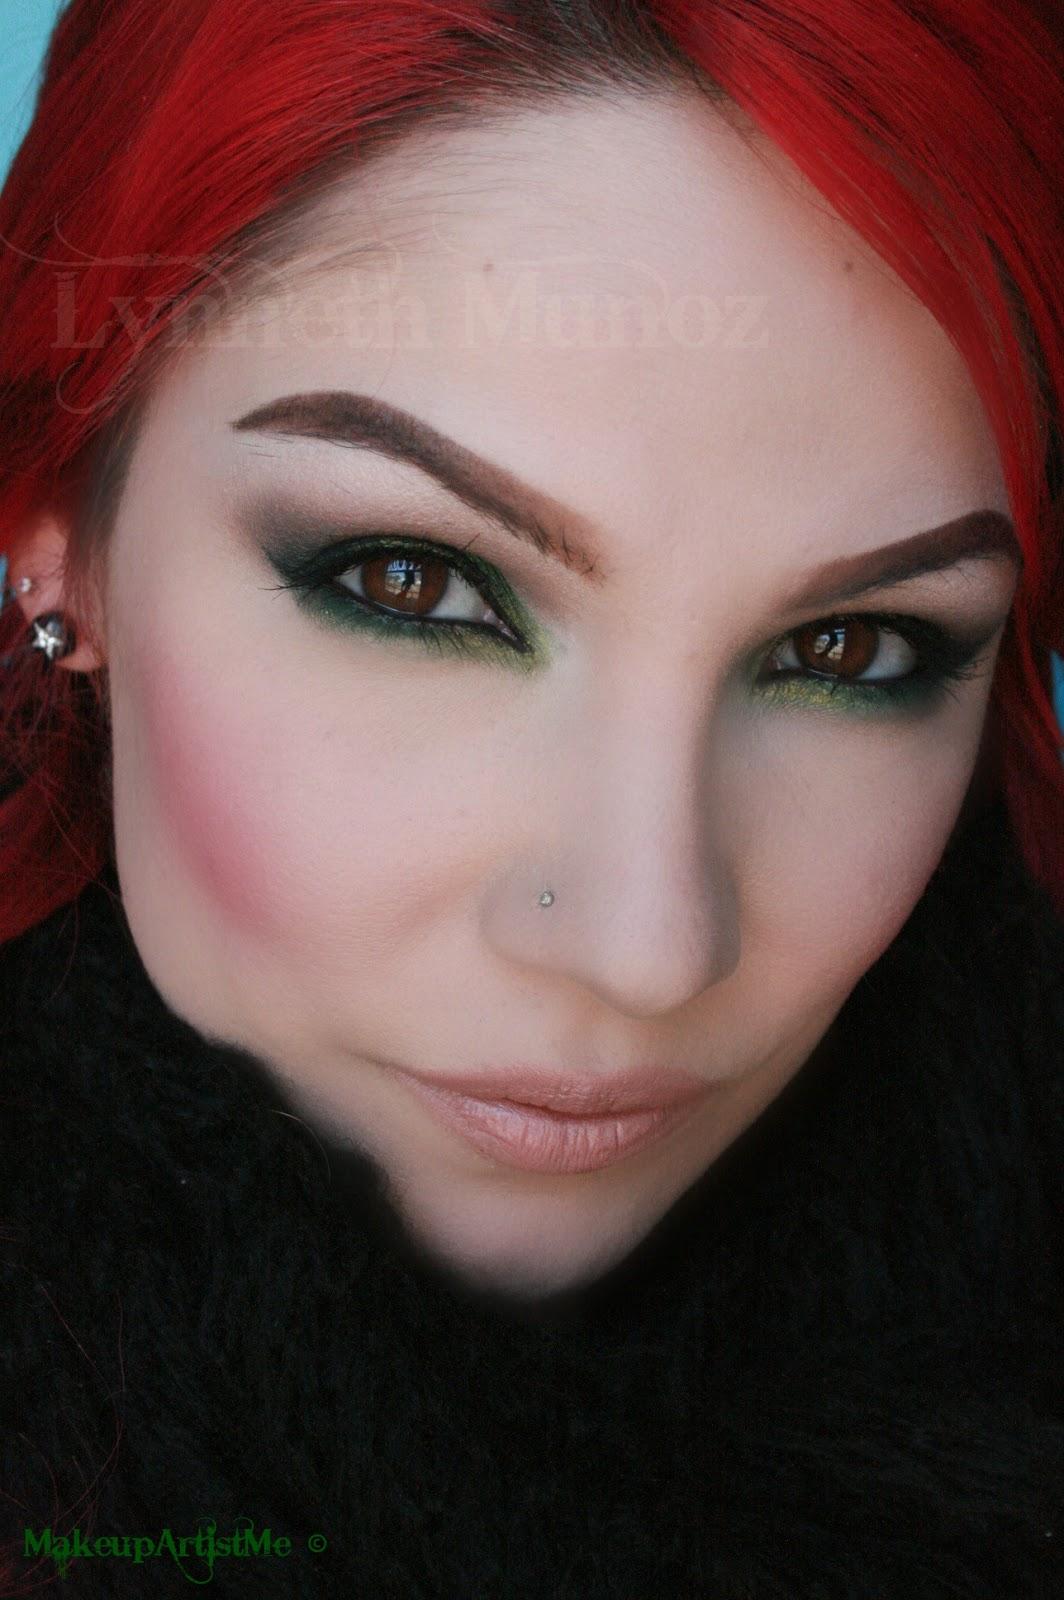 Make Up Artist Me Quot Emerald Smoke Quot Makeup Tutorial